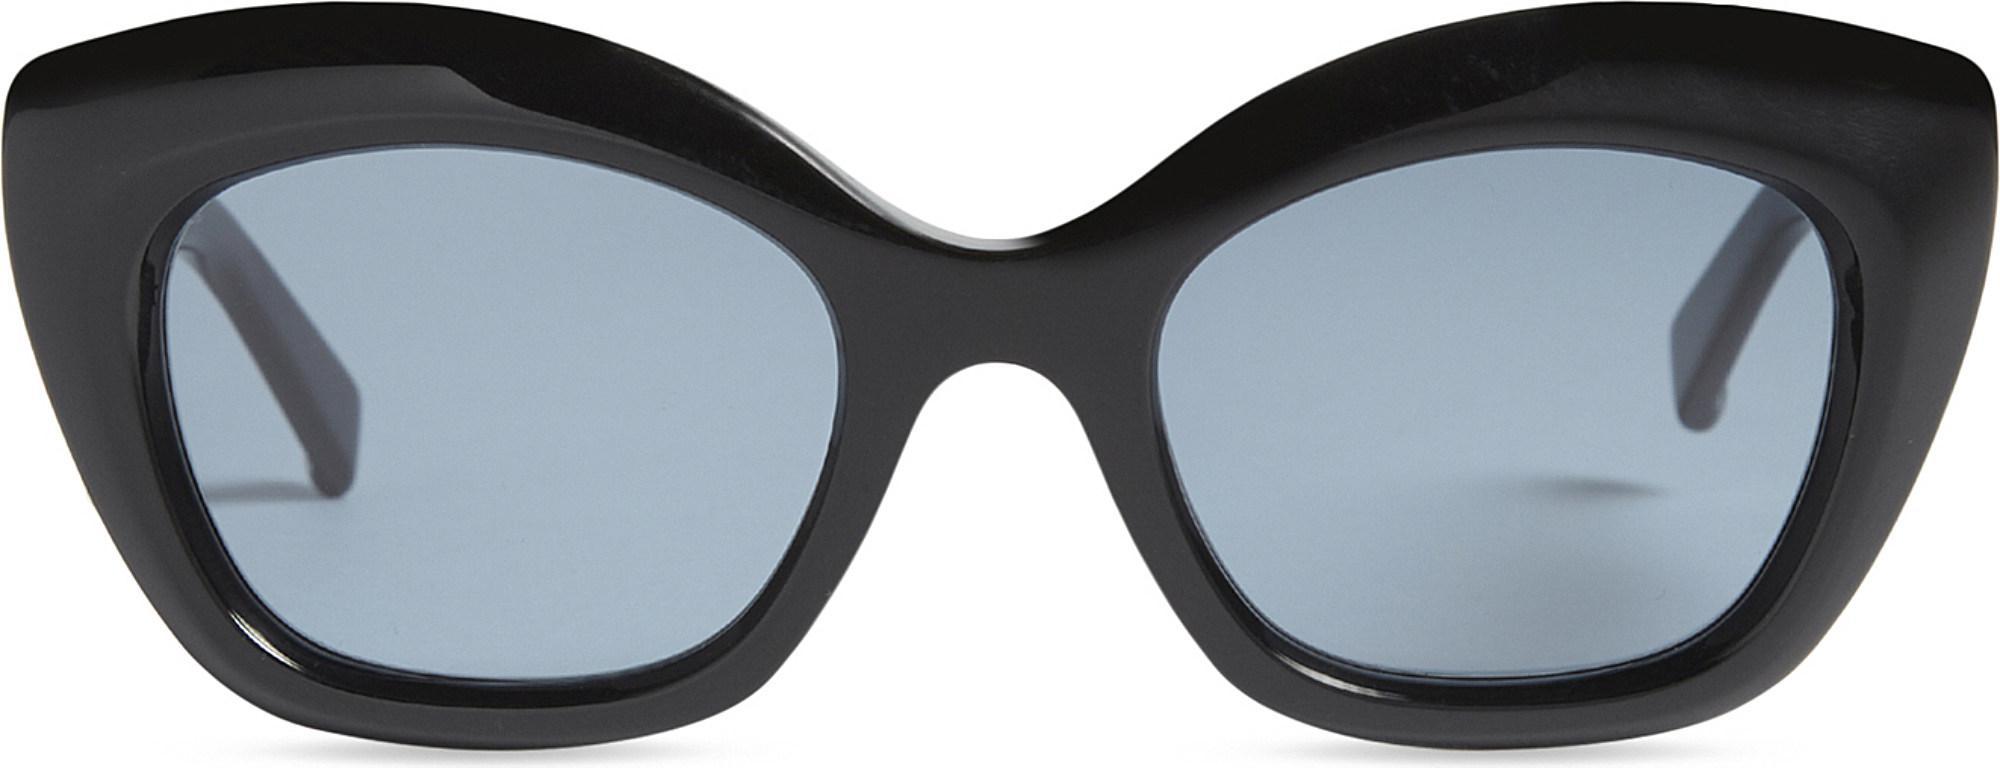 c728b07c18f Lyst - Max Mara Prism Cat-eye Frame Sunglasses in Black